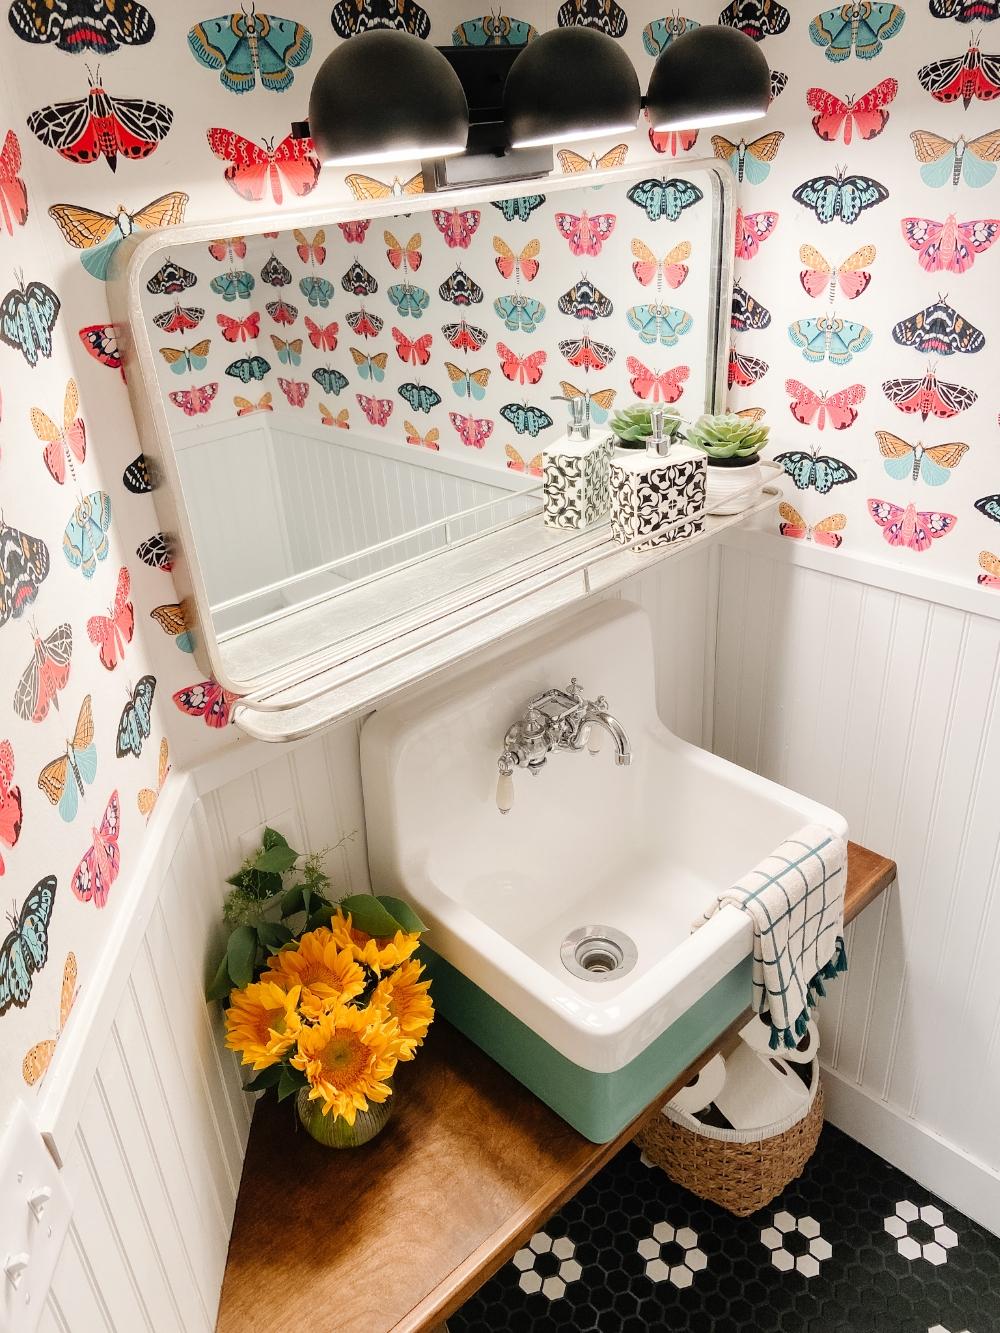 10 Ways to Make a Tiny Half Bath Seem Bigger. Tips and tricks to make a tiny bathroom seem spacious and memorable!